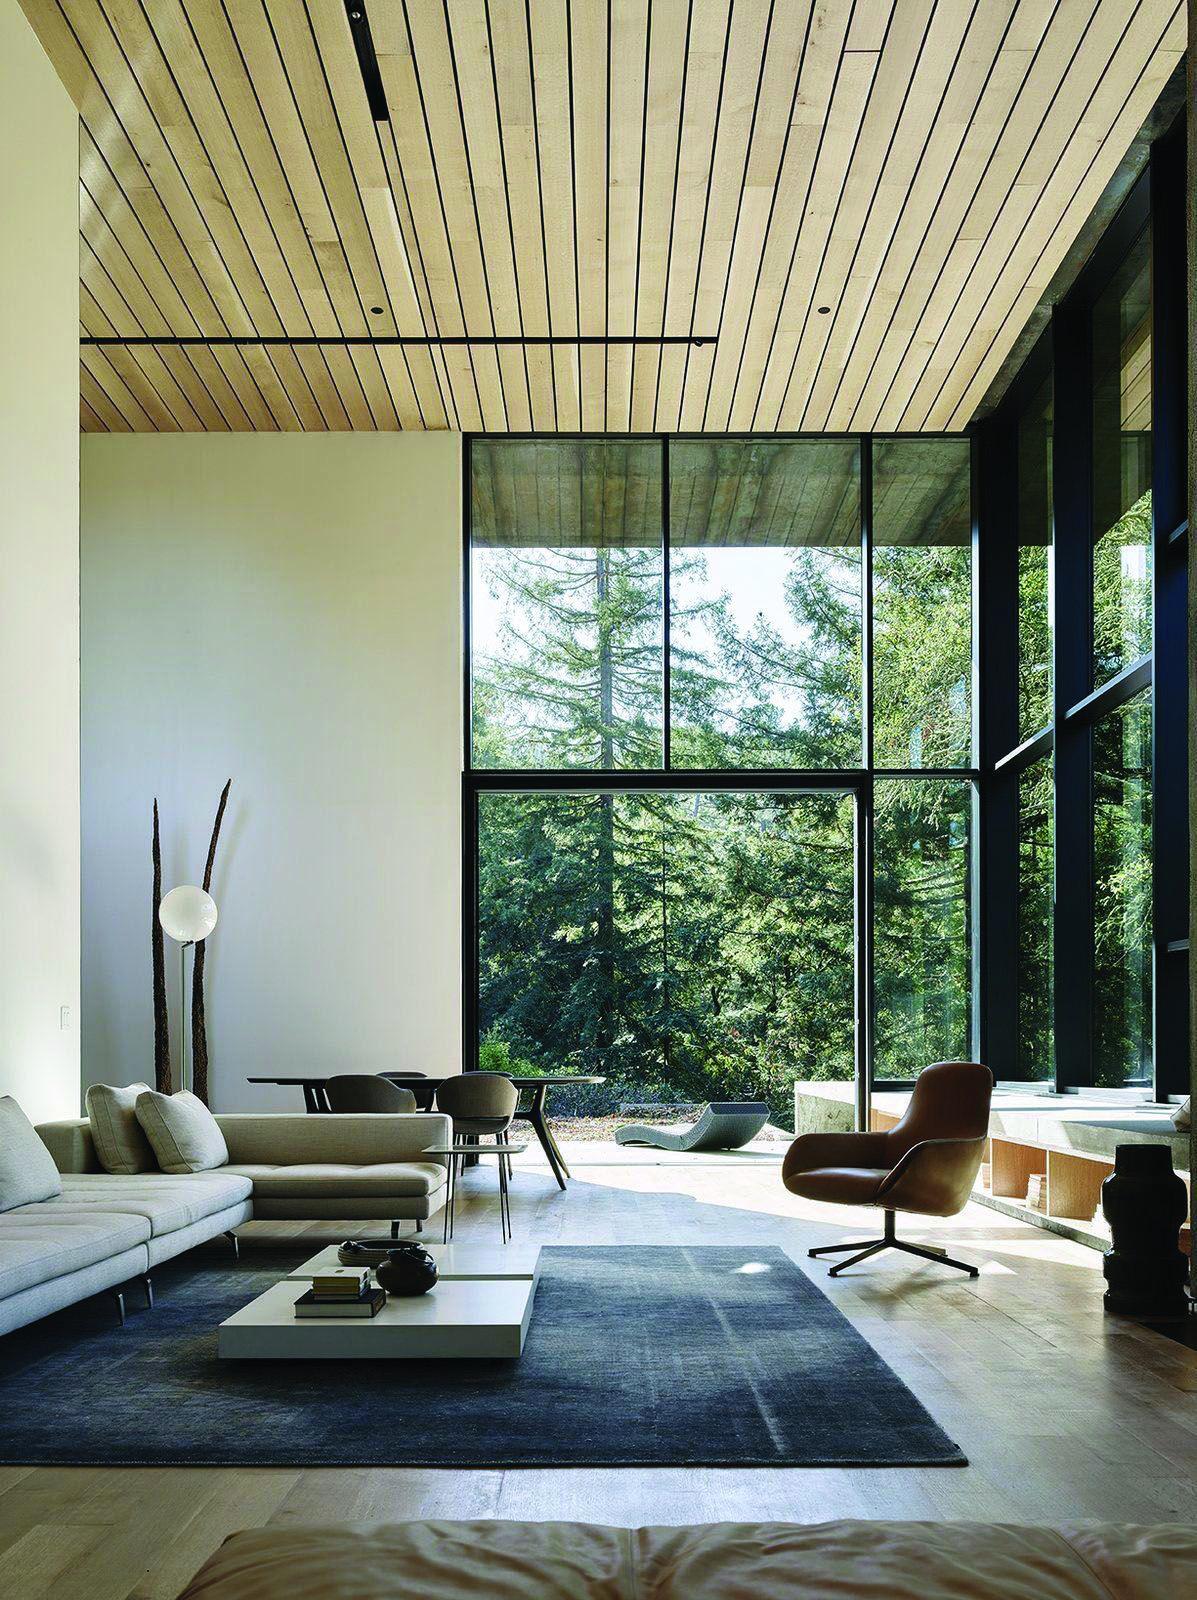 15 Luxury Living Room Designs Stunning Homes Tre Luxury Interior Design Home Interior Design Contemporary Home Decor